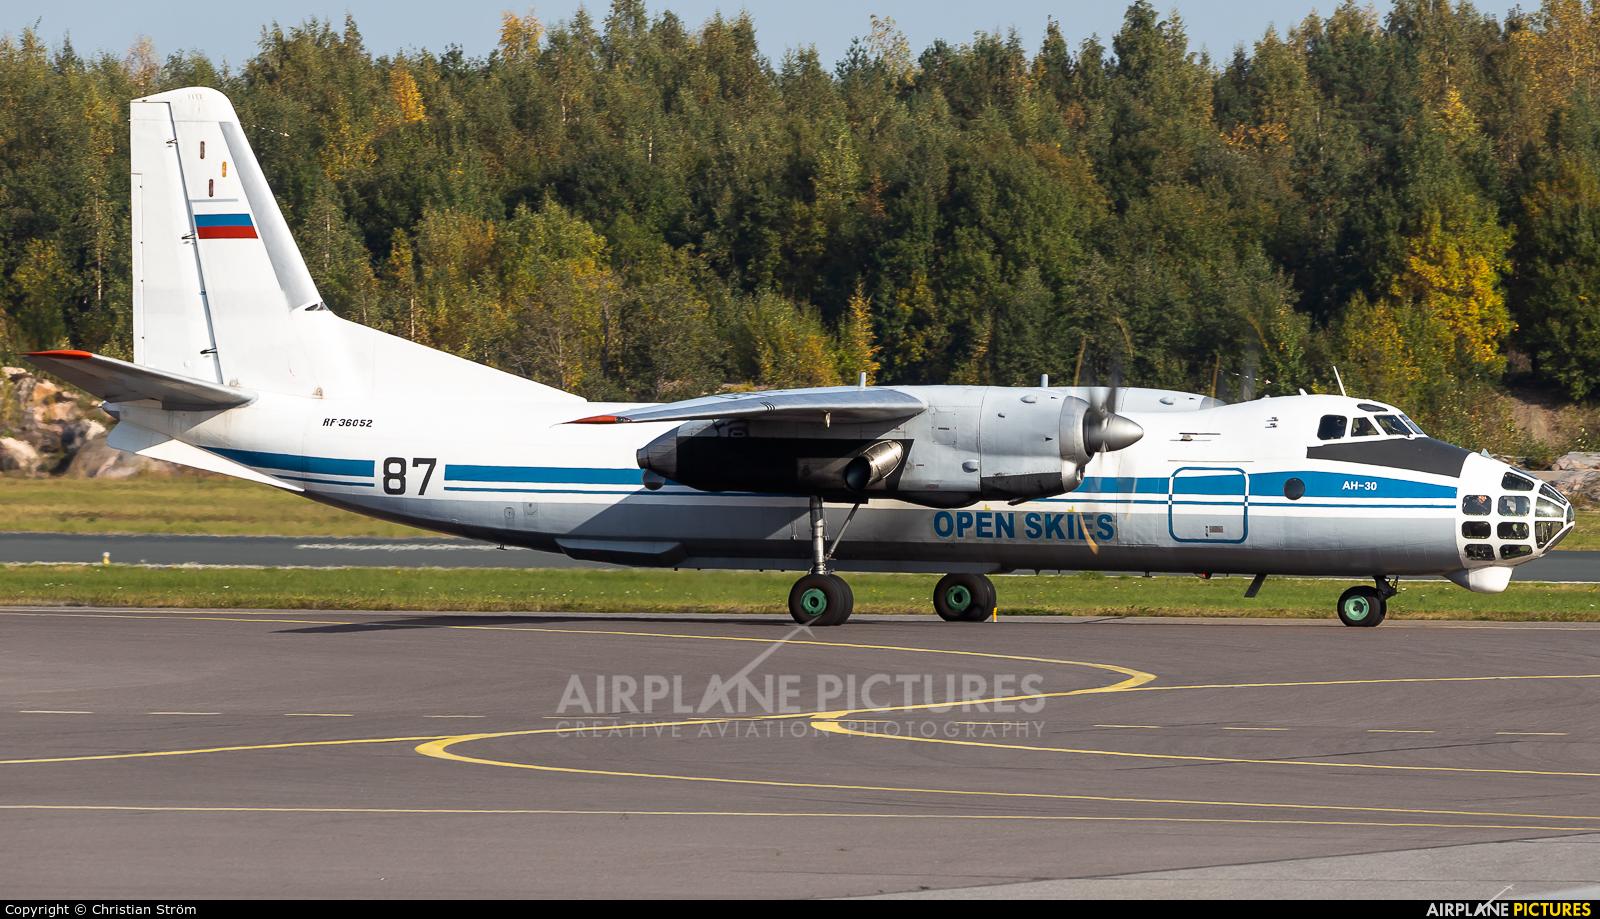 Russia - Air Force RF-36052 aircraft at Helsinki - Vantaa